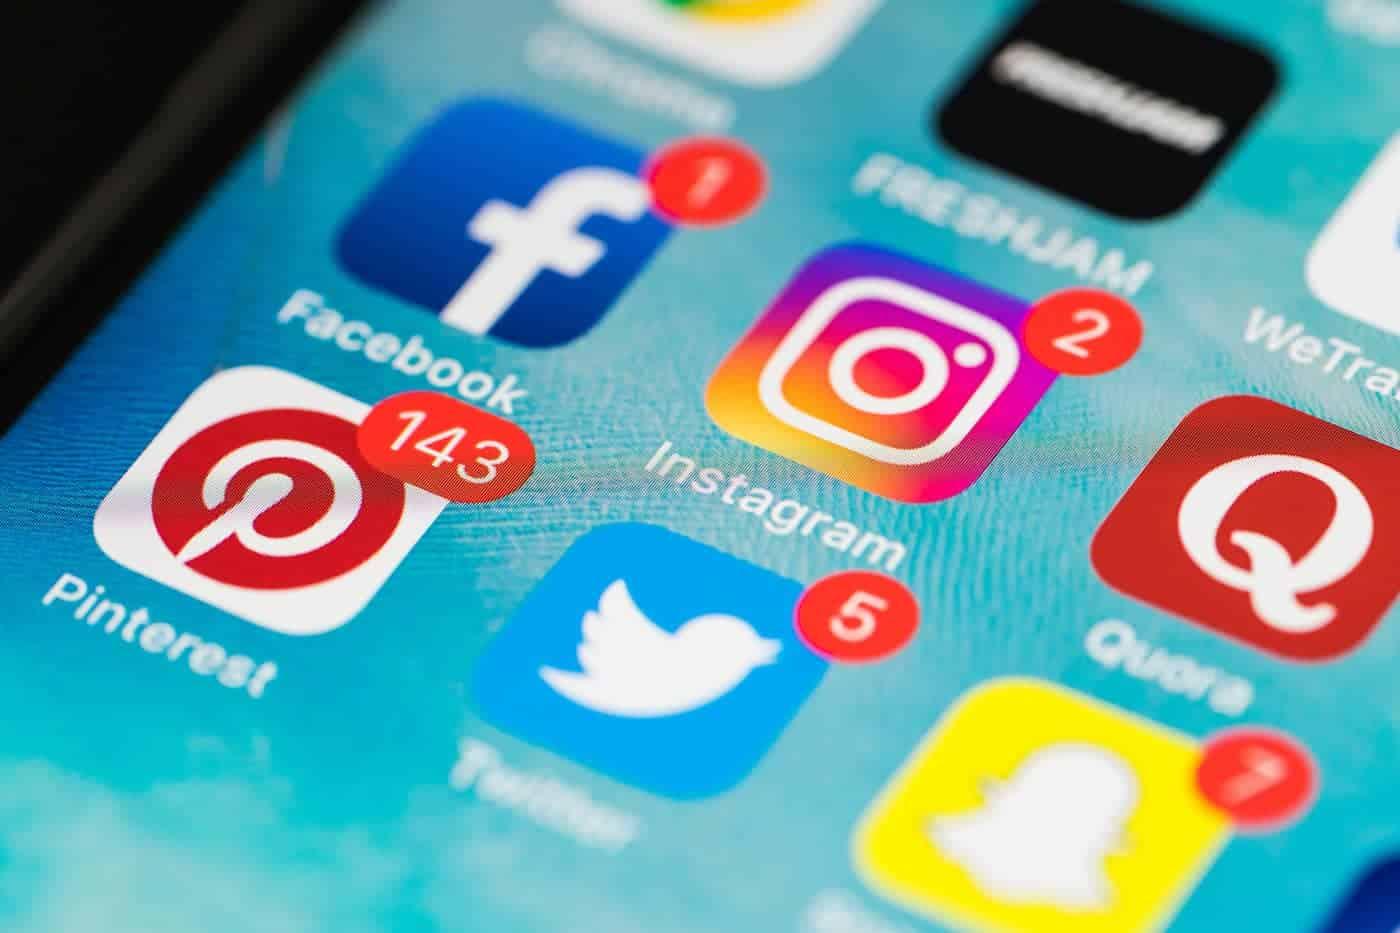 Instagram App on Phone Screen